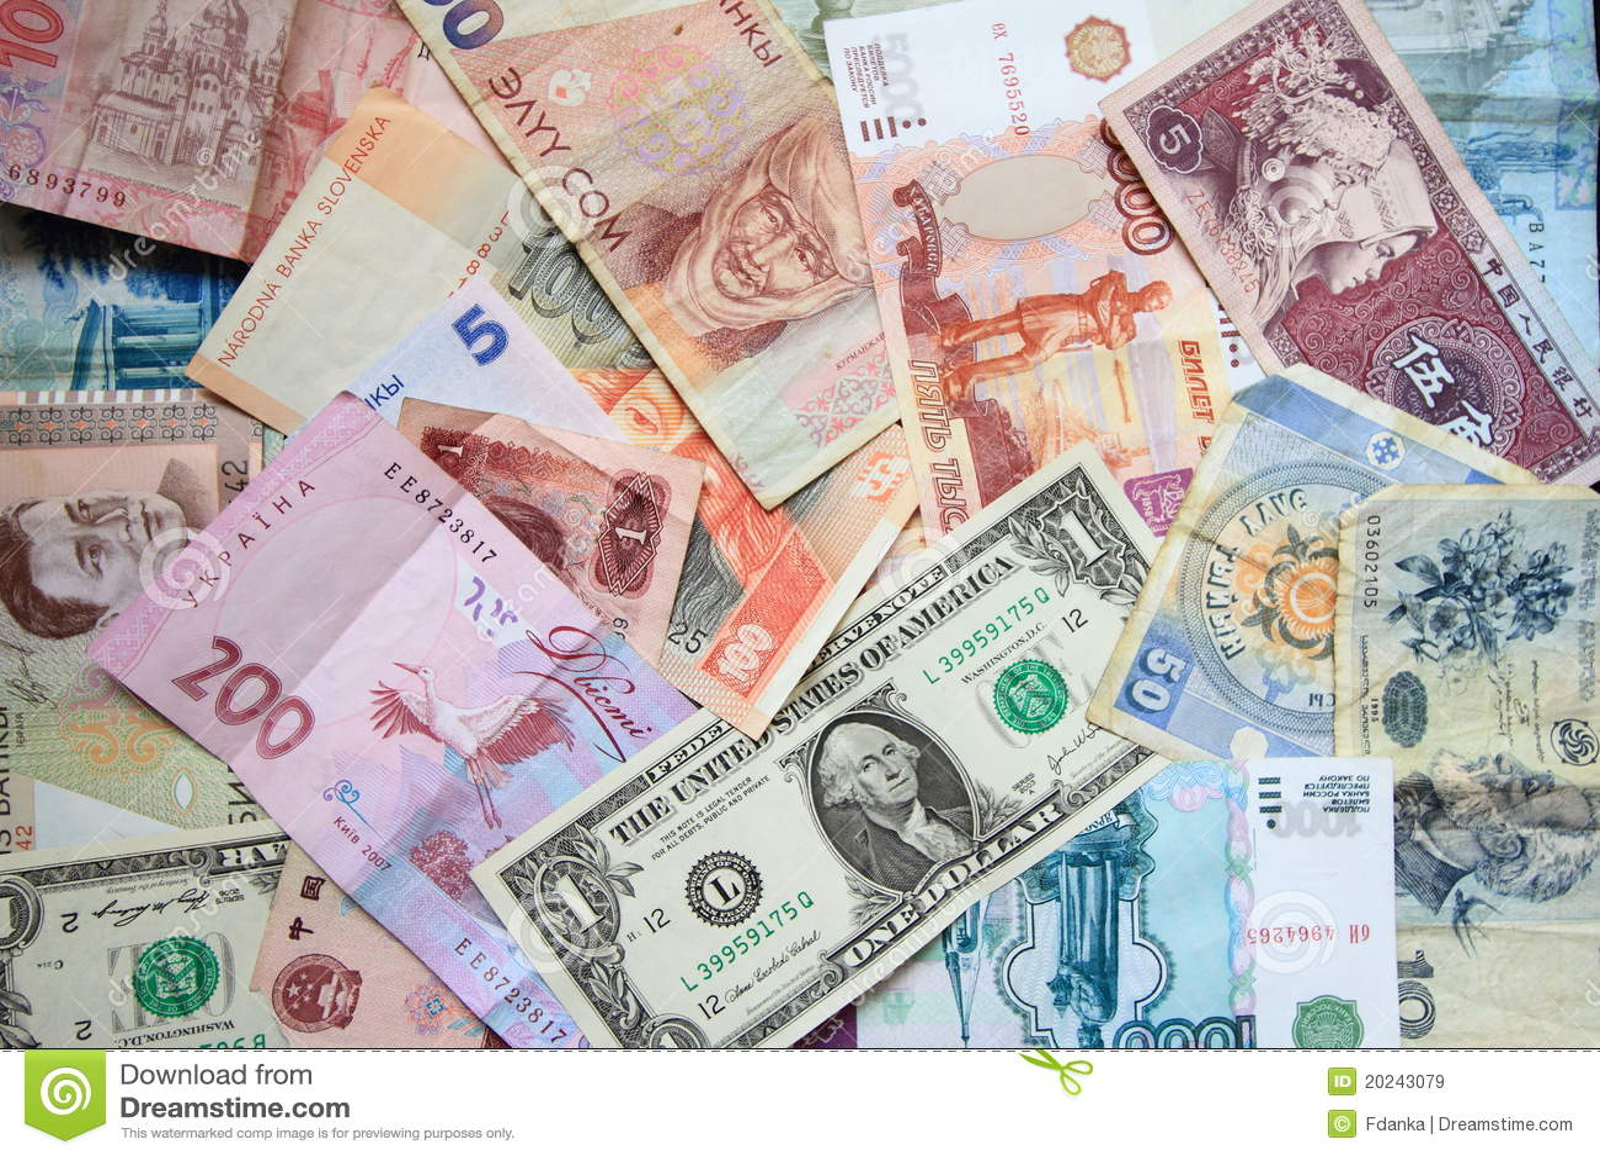 Popular currencies